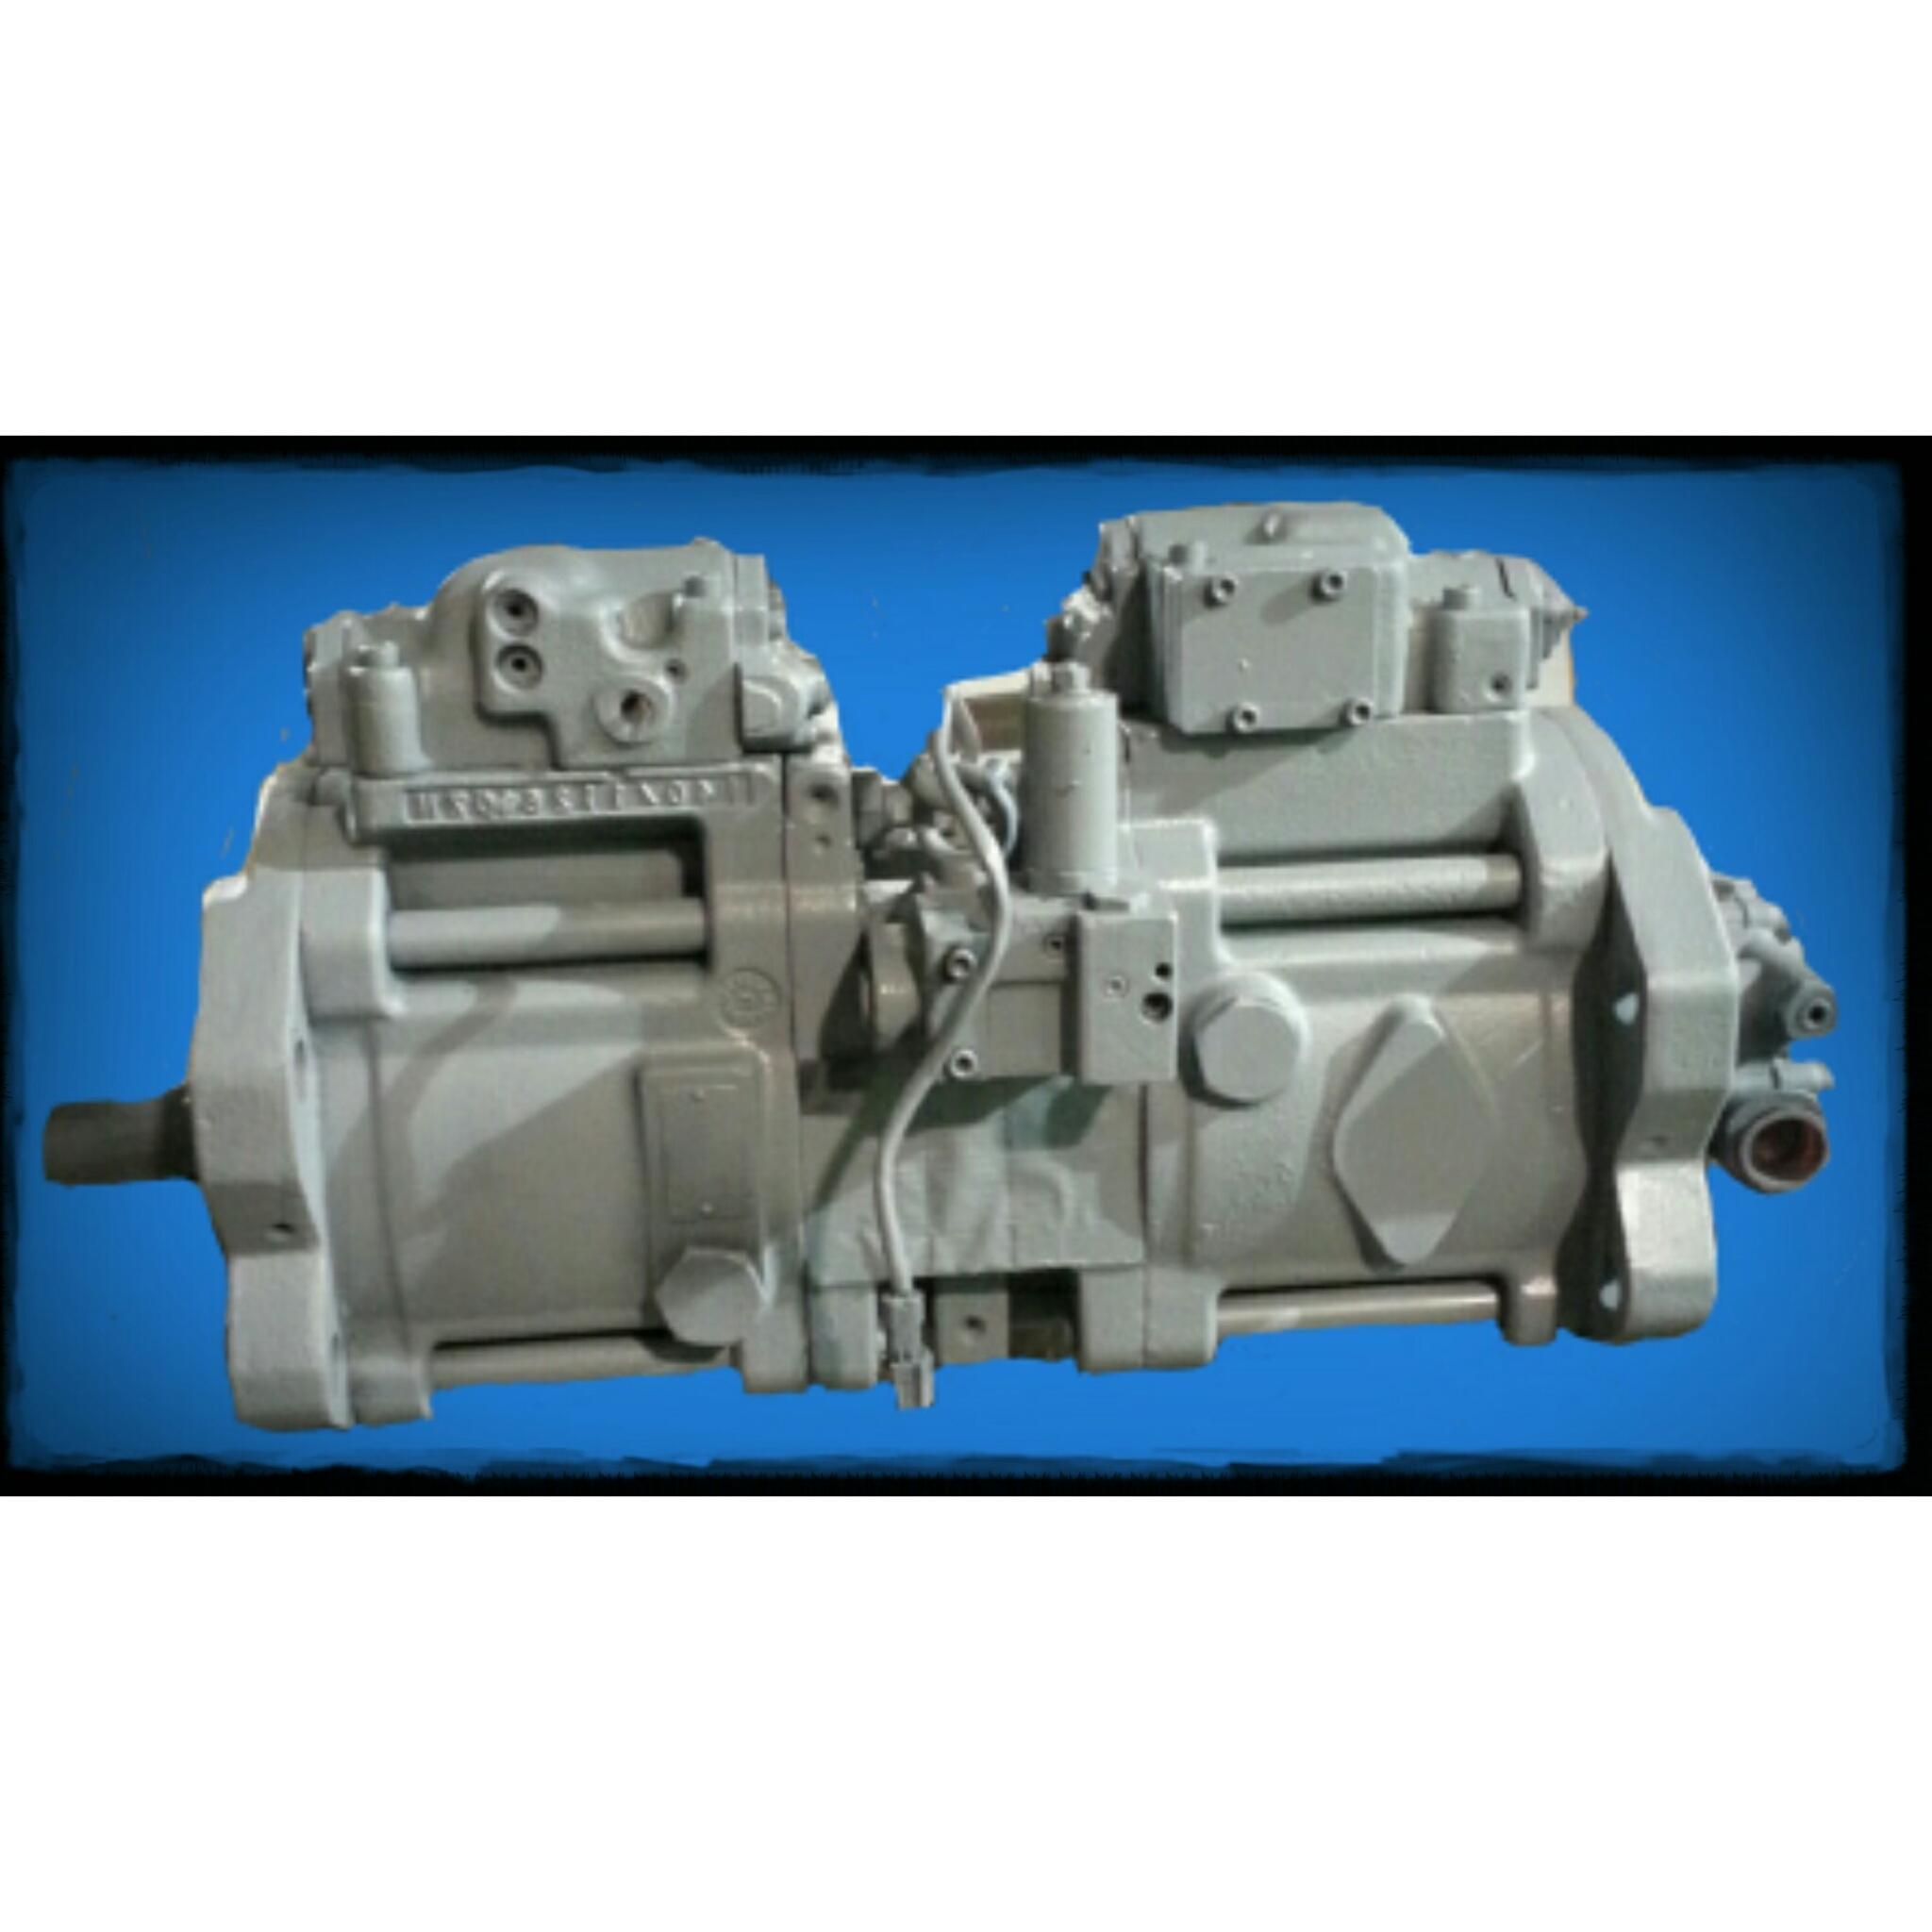 Bush Hog Aftermarket Hydraulic Parts